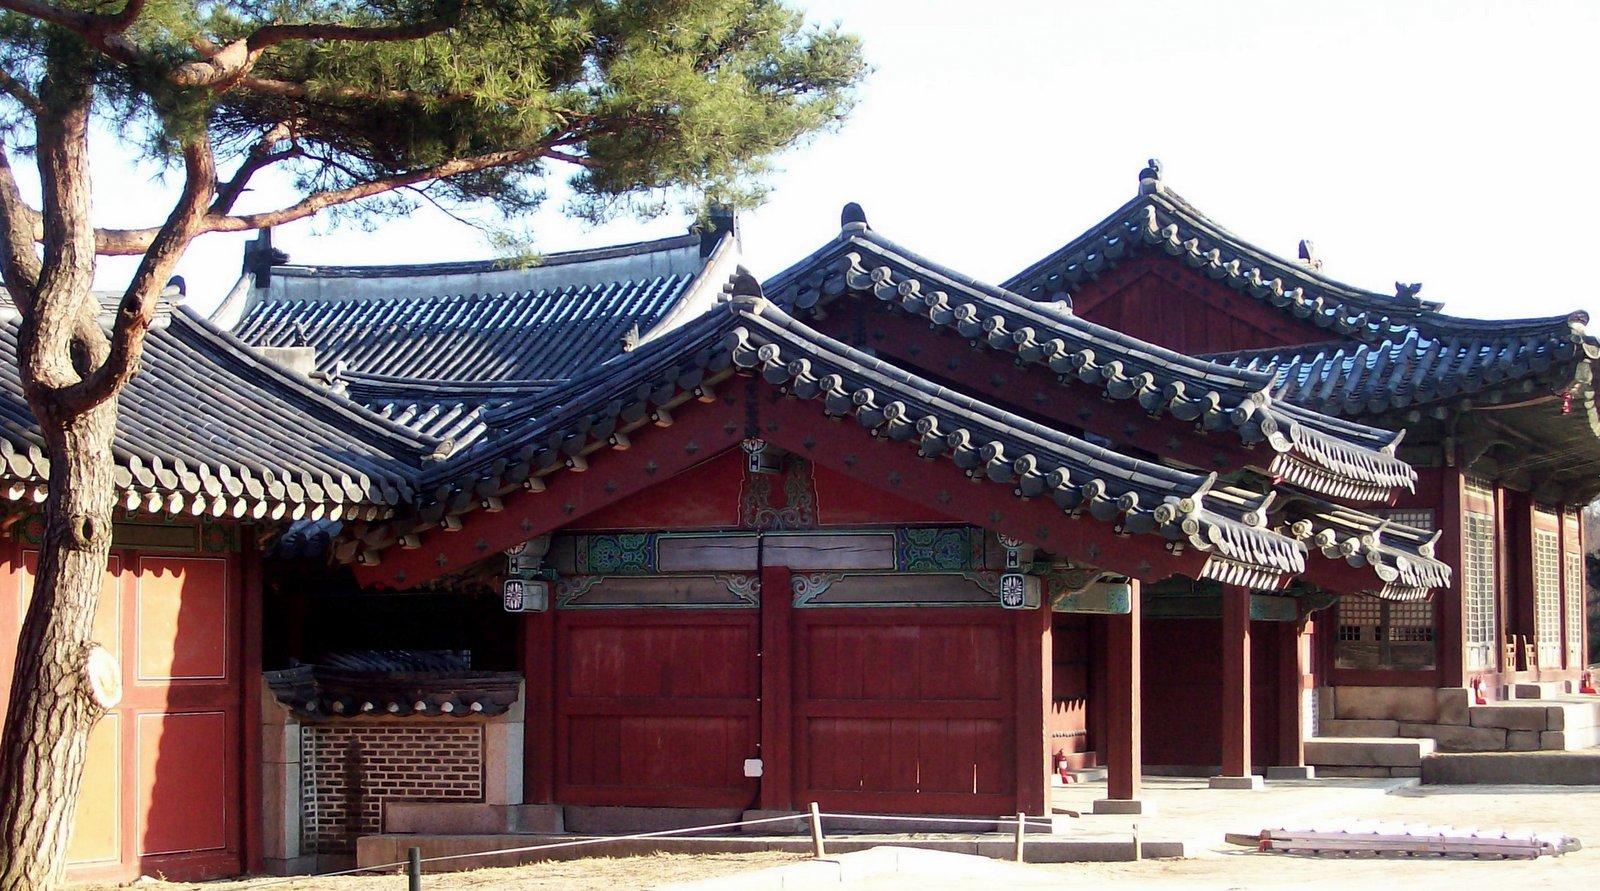 Tongmyeongjeon